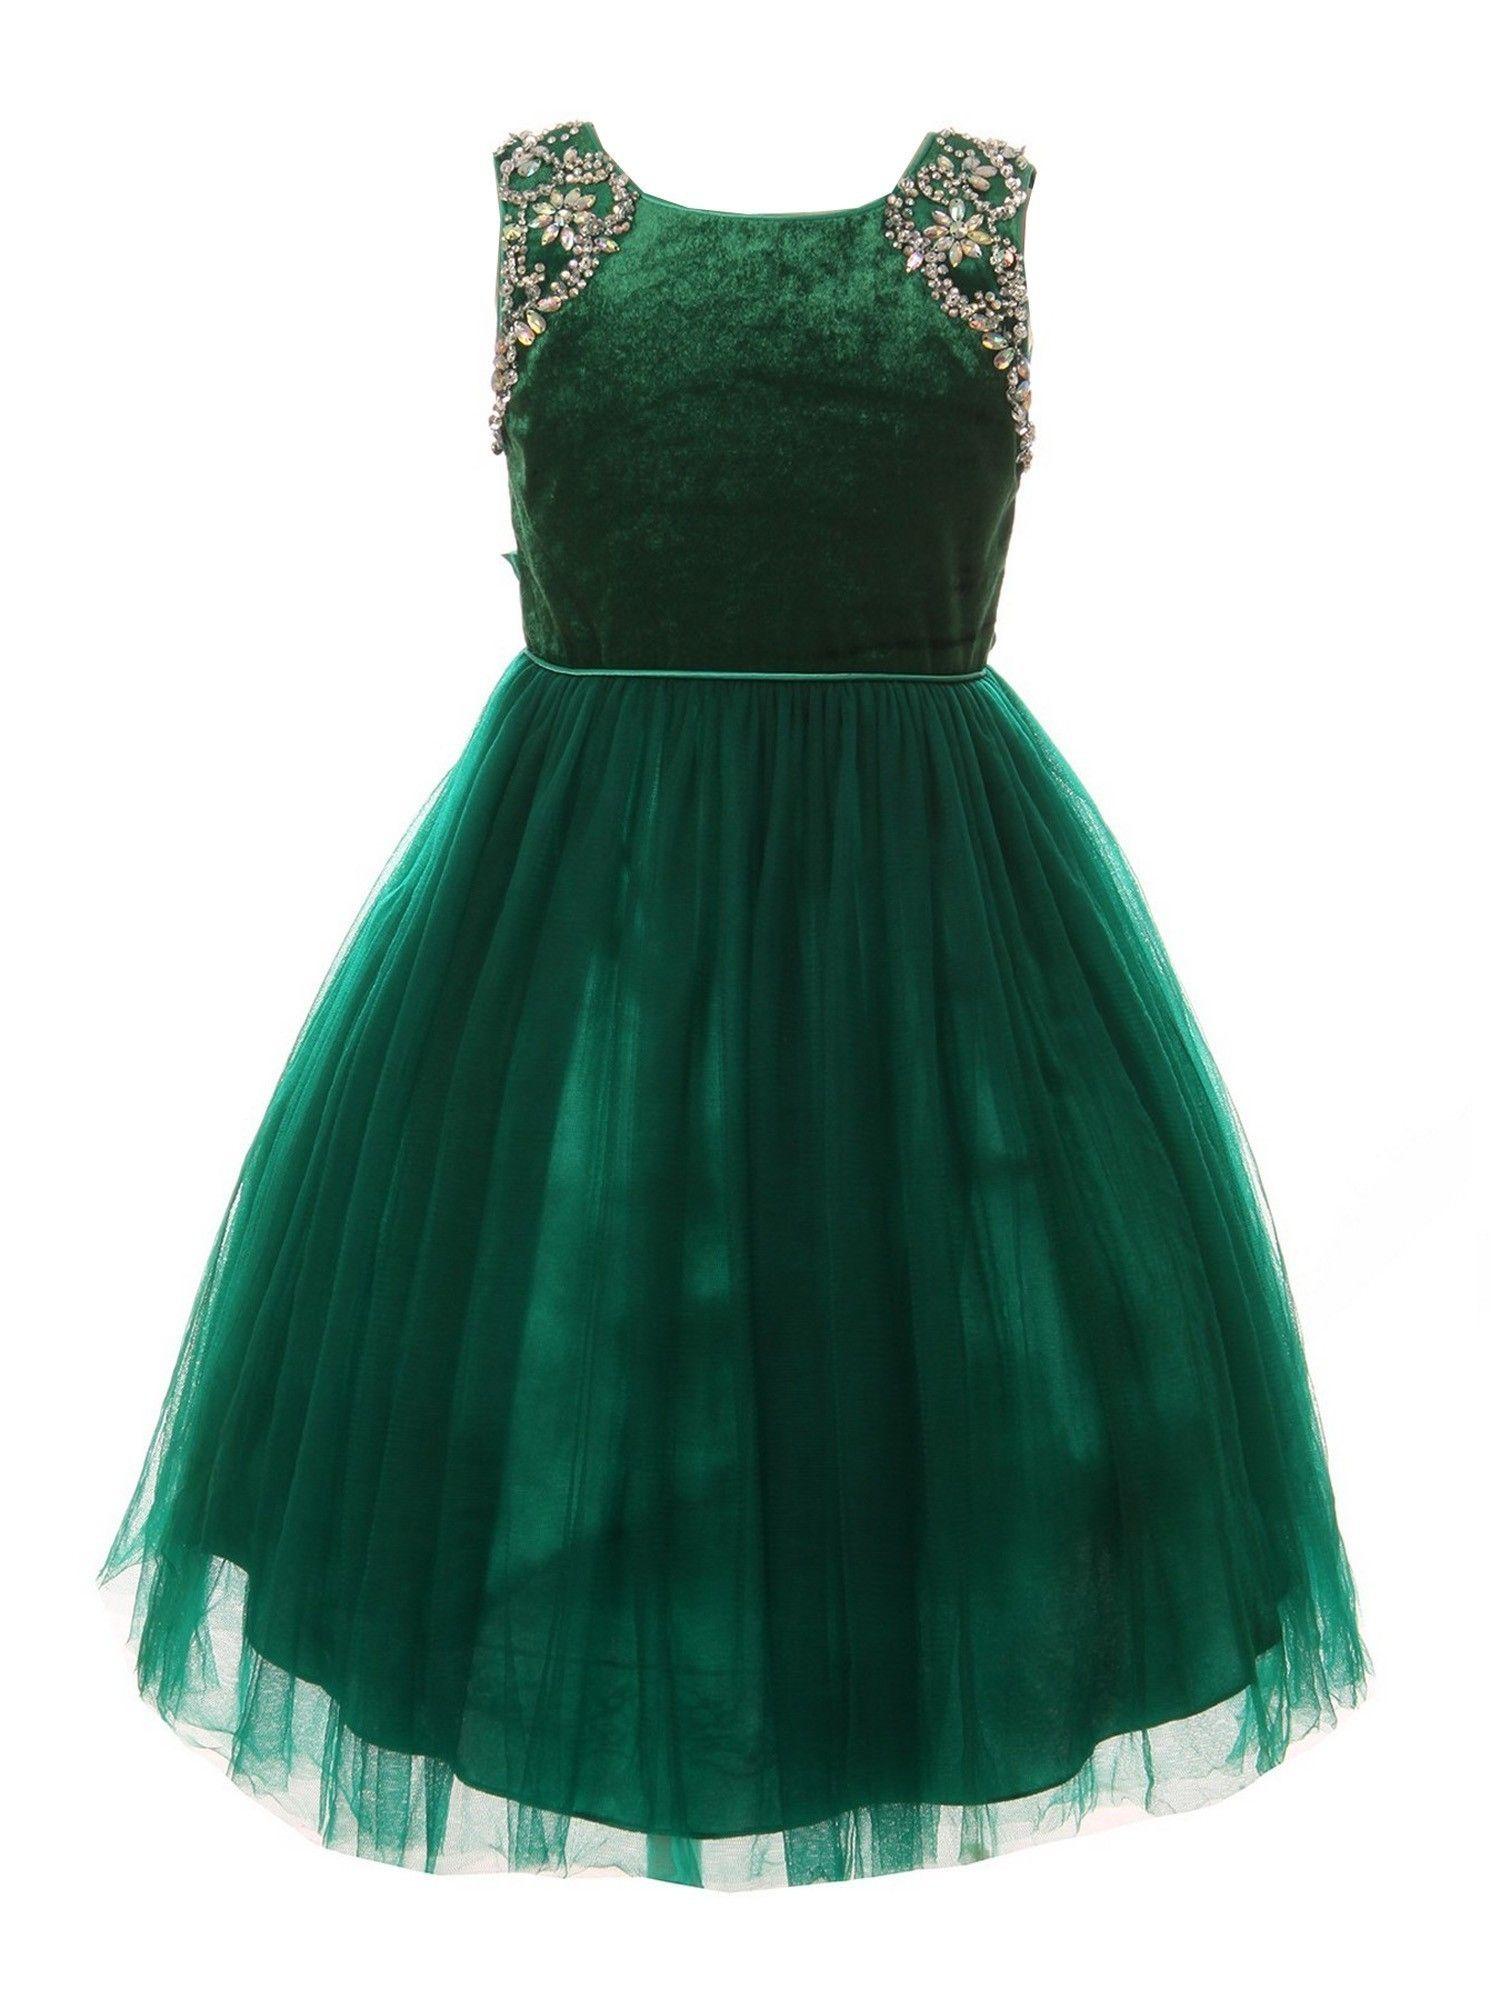 Cinderella Couture Little Girls Green Velvet Sparkle Rhinestone Tulle T Length Christmas Dress Walmart Com Holiday Dress Outfit Girls Christmas Dresses Toddler Girl Dresses [ 2000 x 1500 Pixel ]